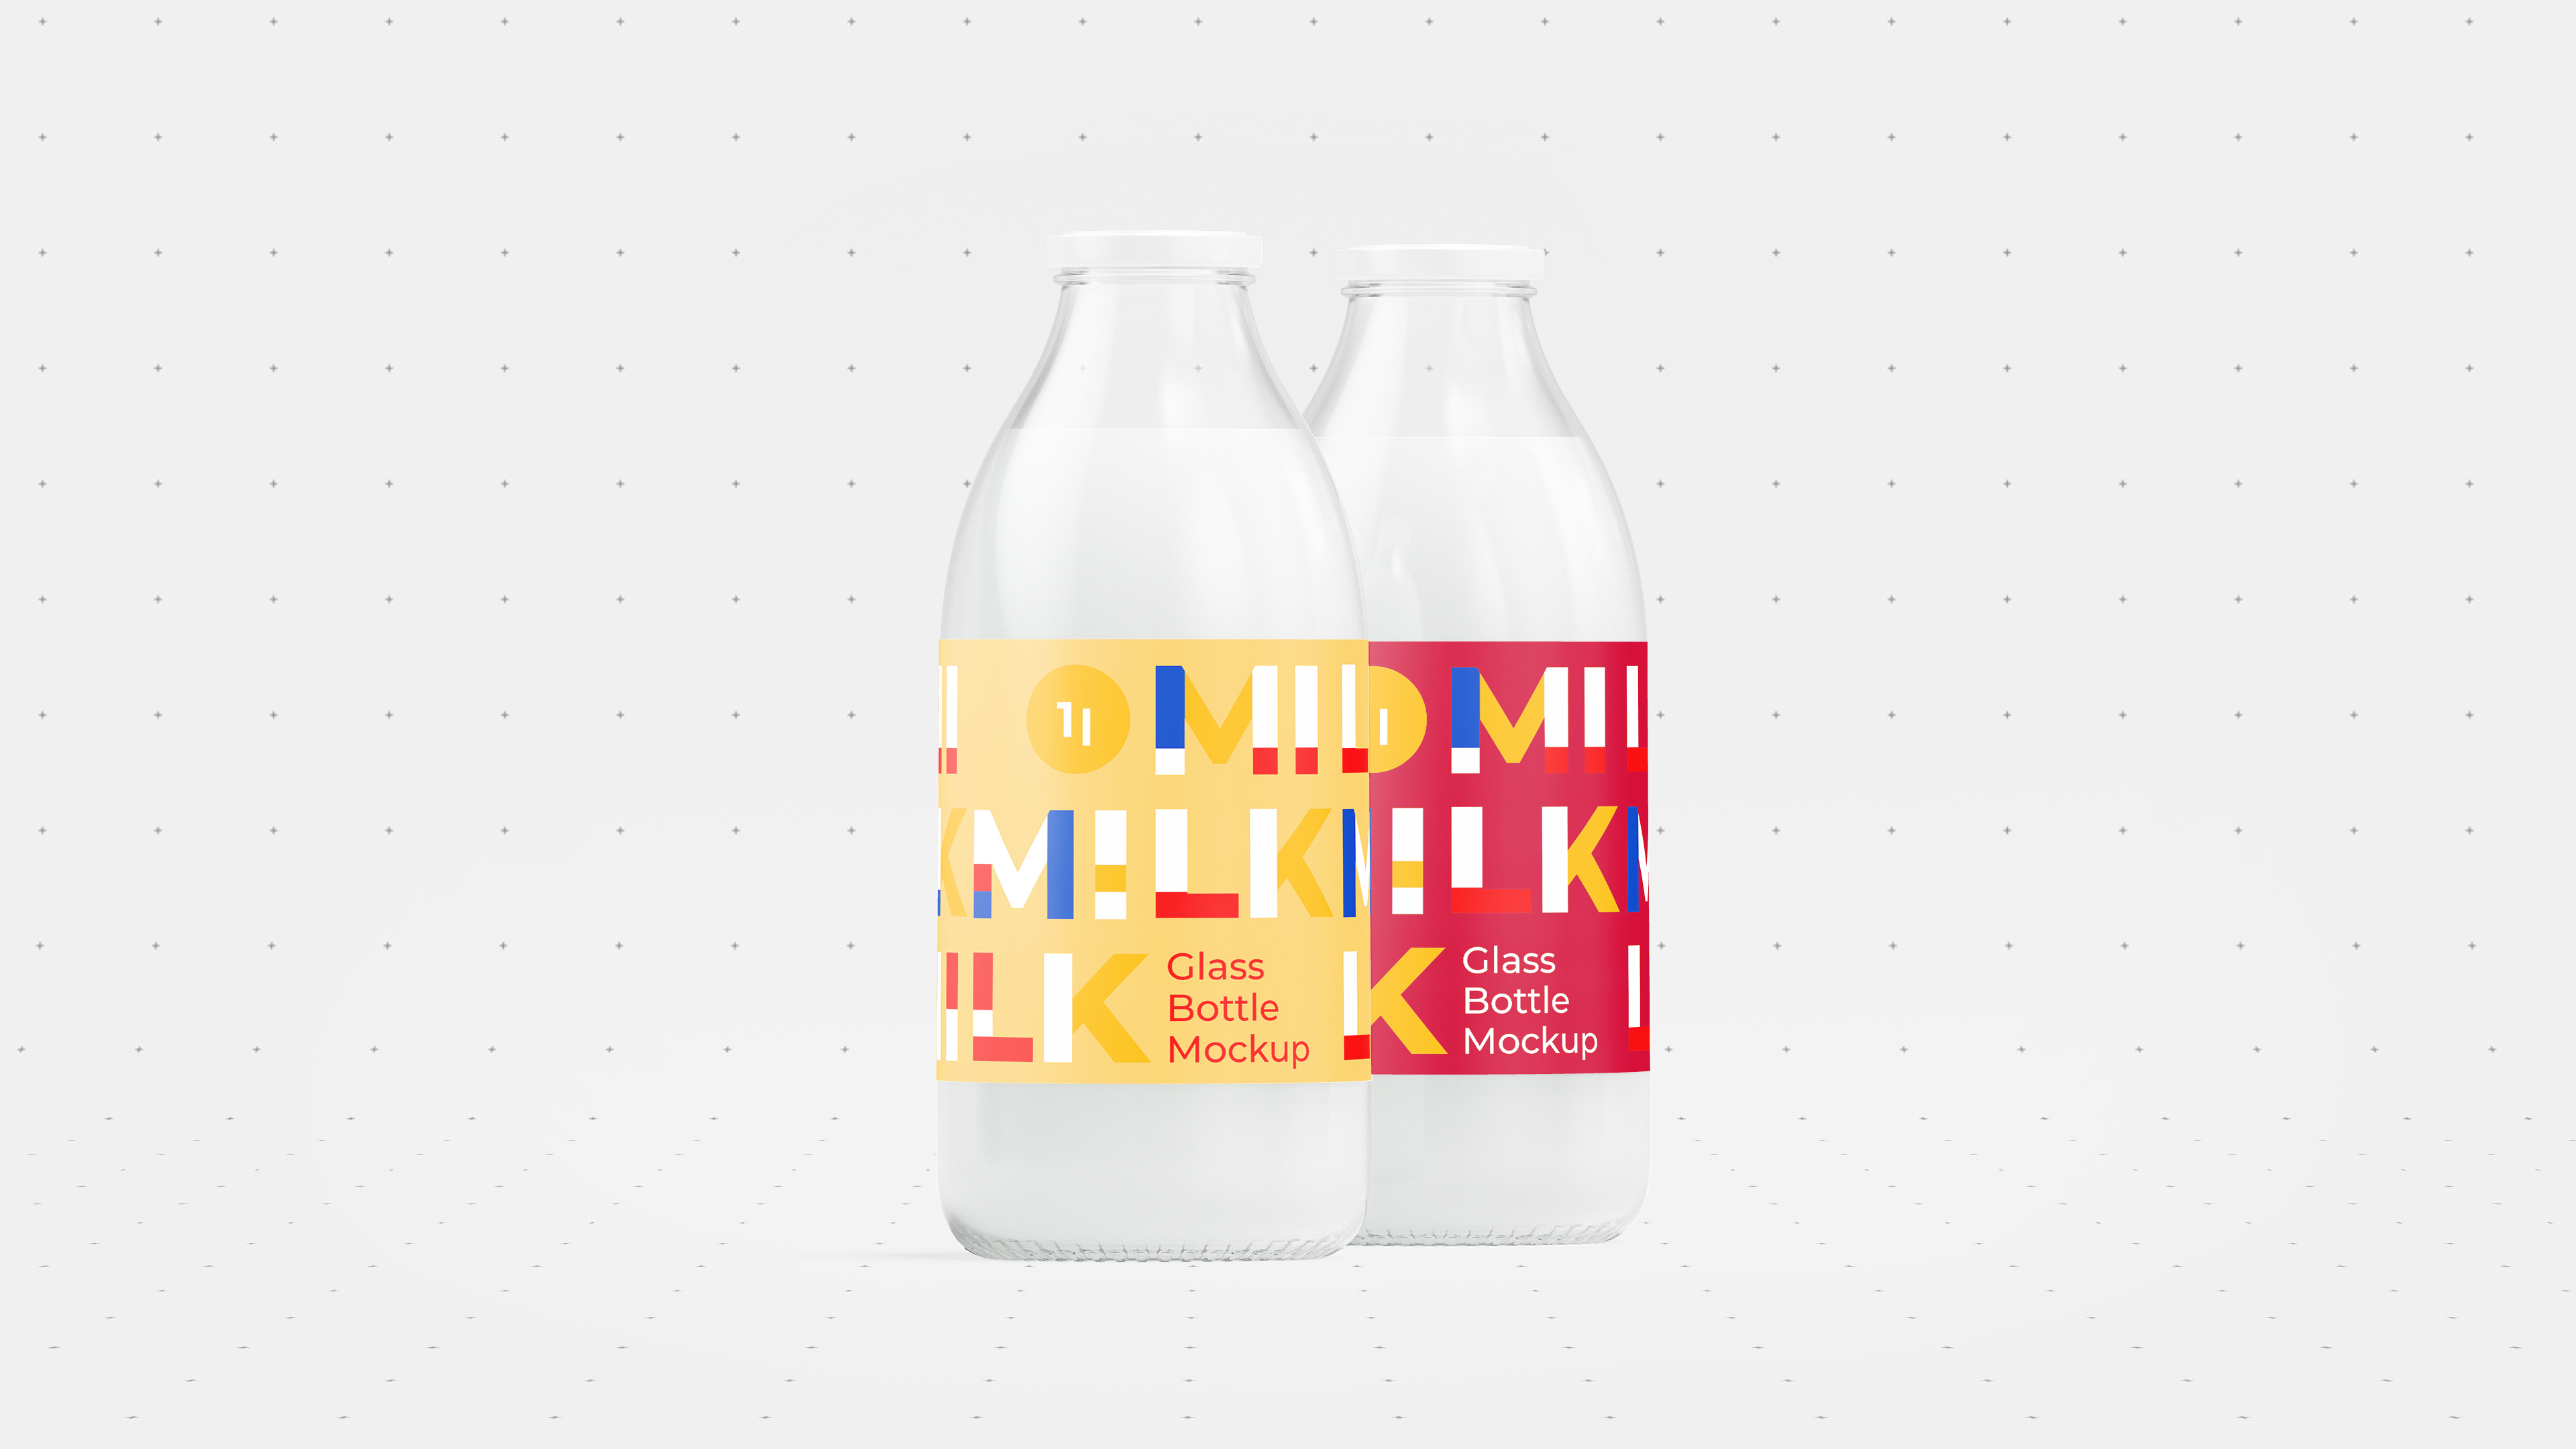 Milk Bottle Mockup 4